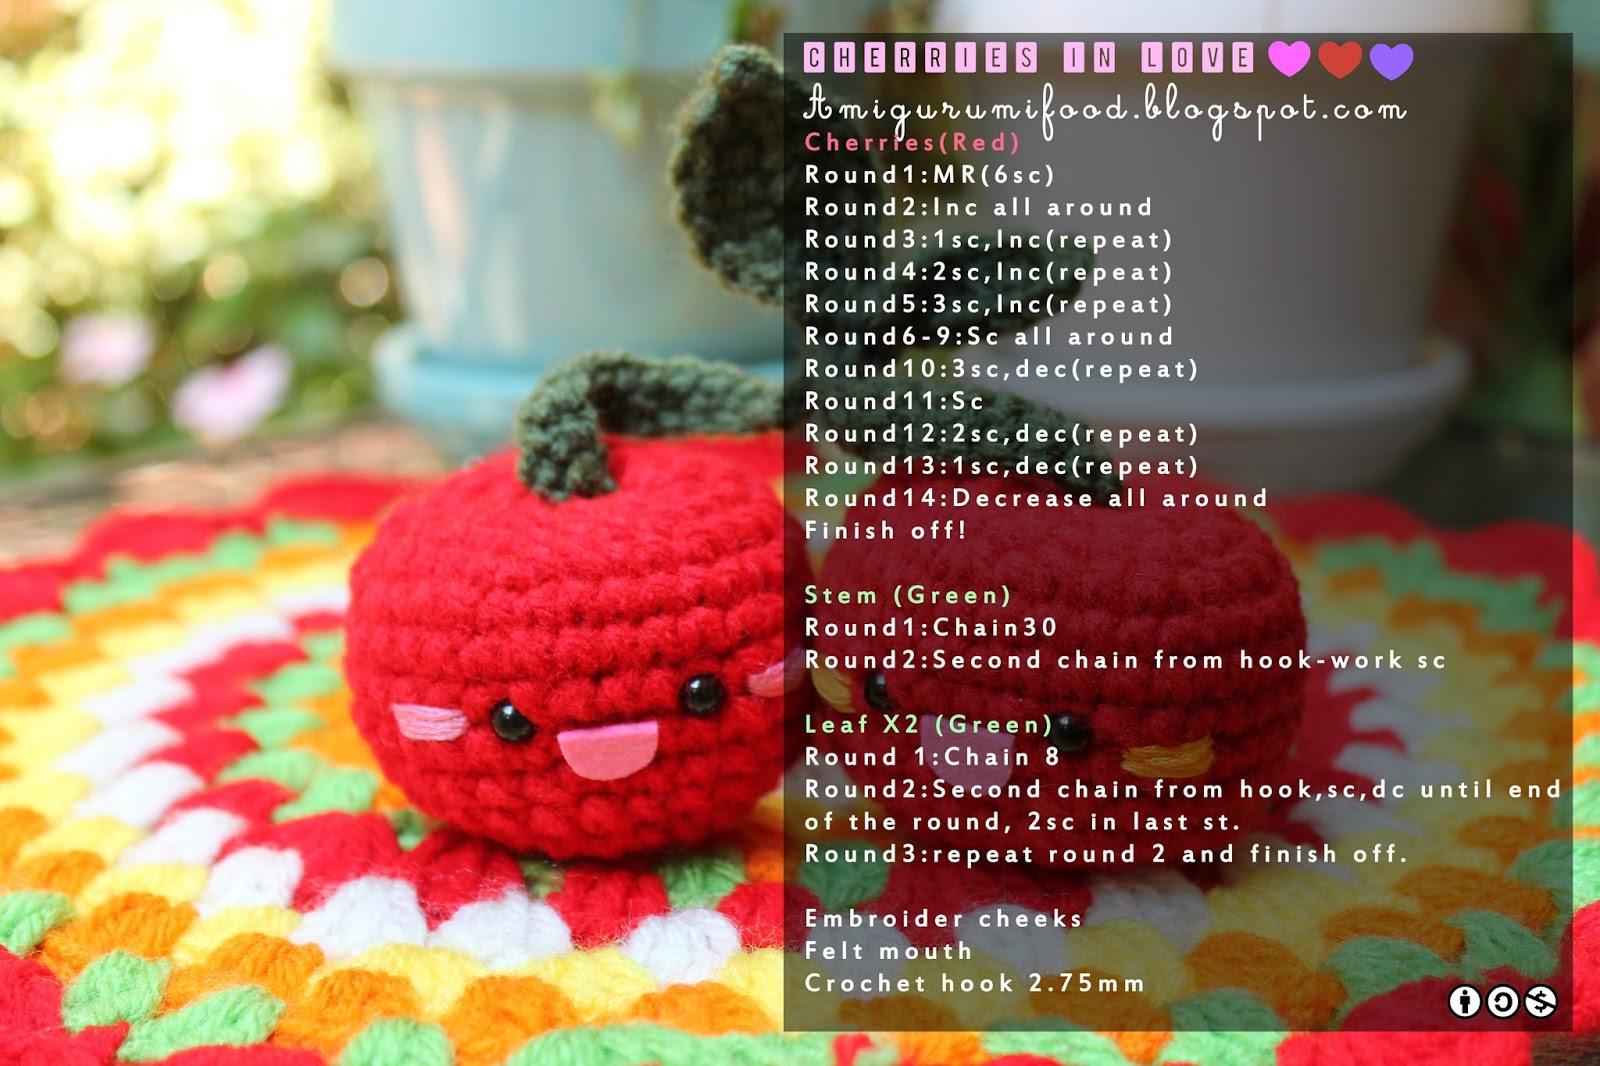 Amigurumi Patterns Free Food : Amigurumi Food: Free Pattern Cherries Amigurumi!